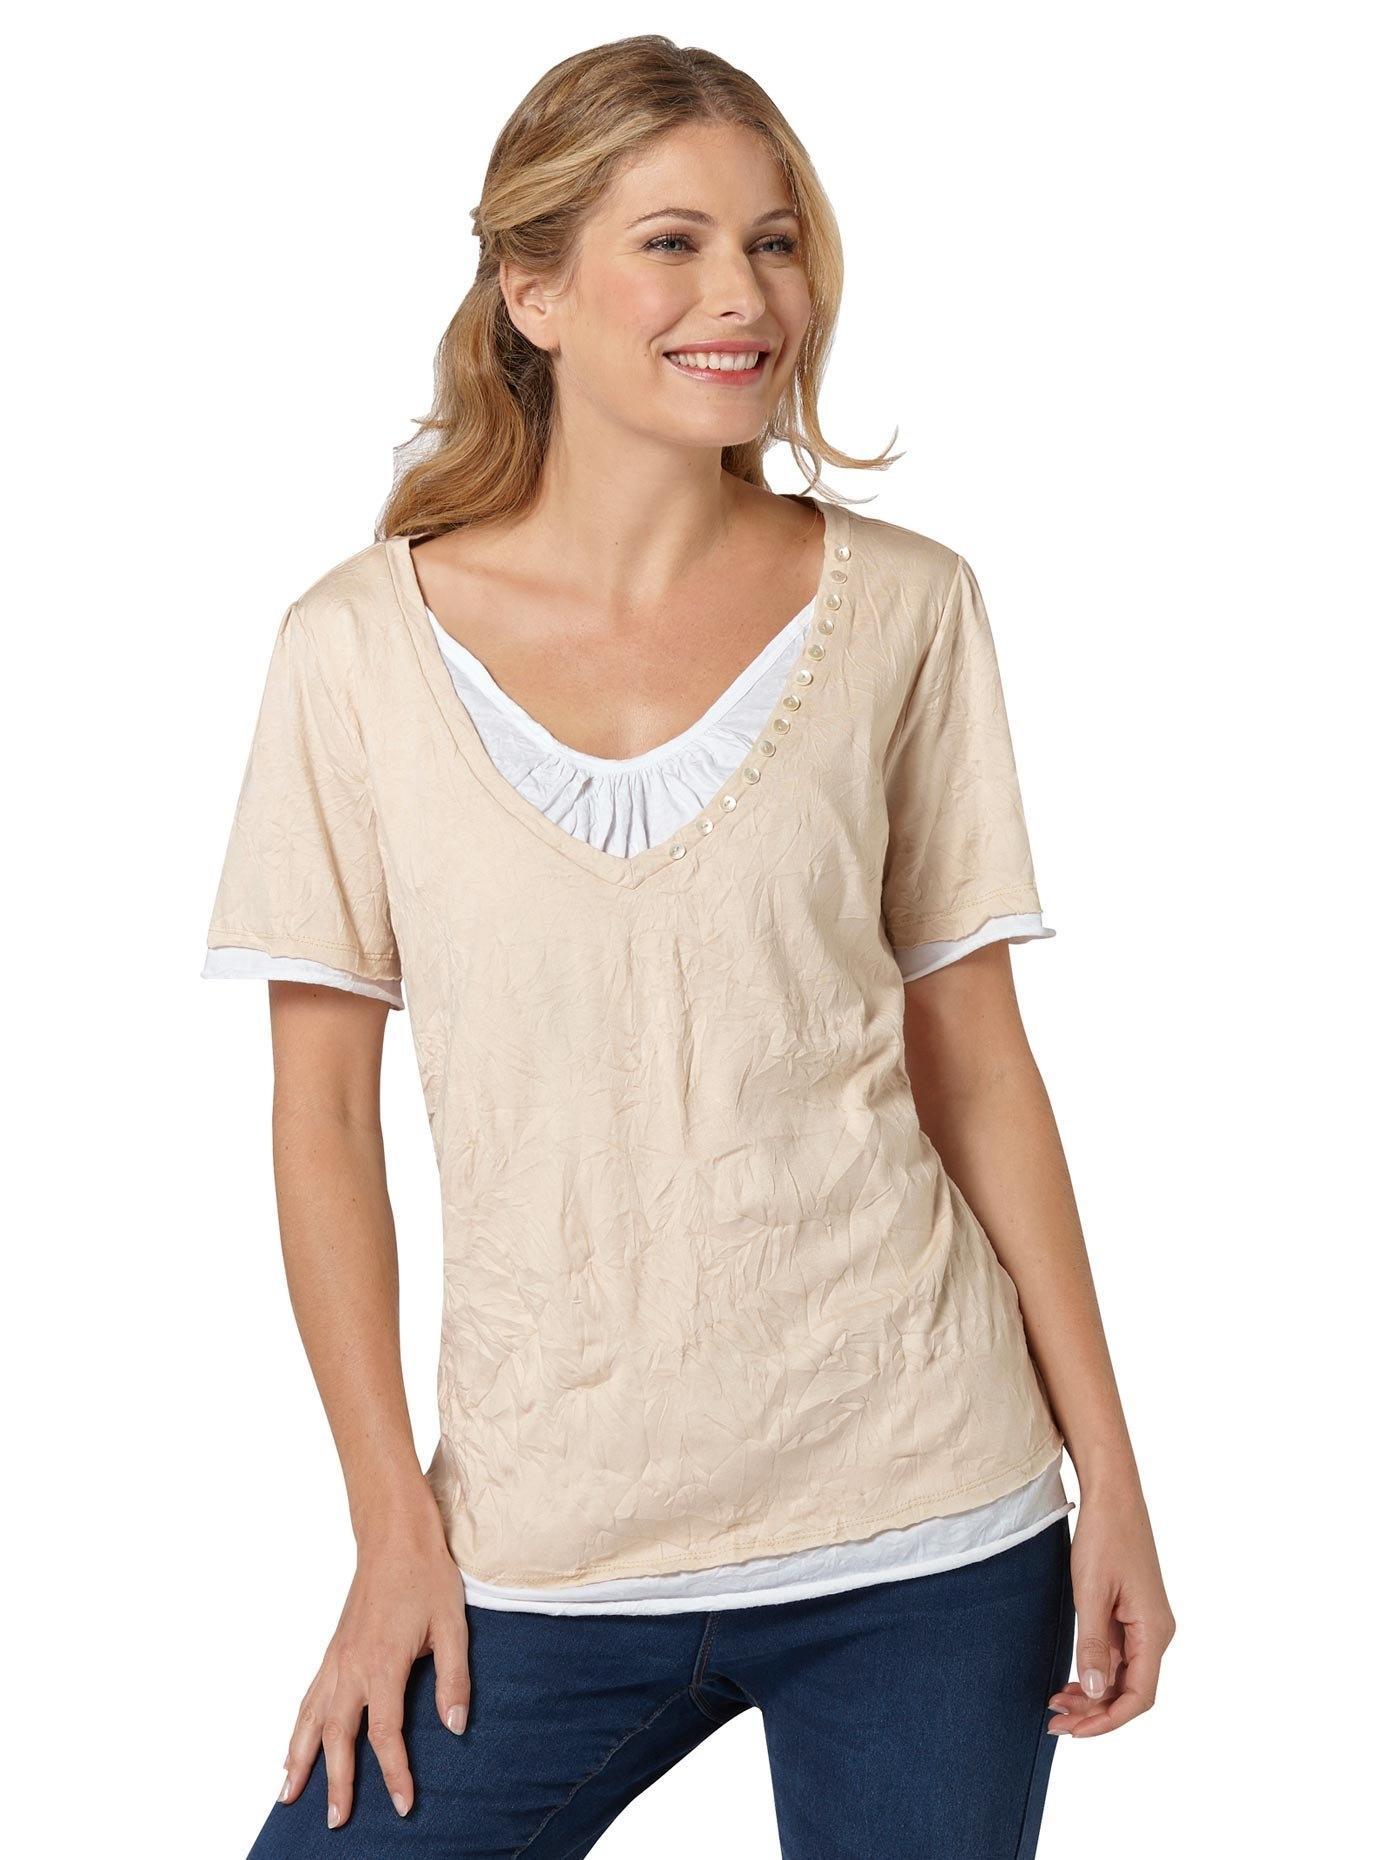 Classic Inspirationen 2-in-1-shirt nu online bestellen